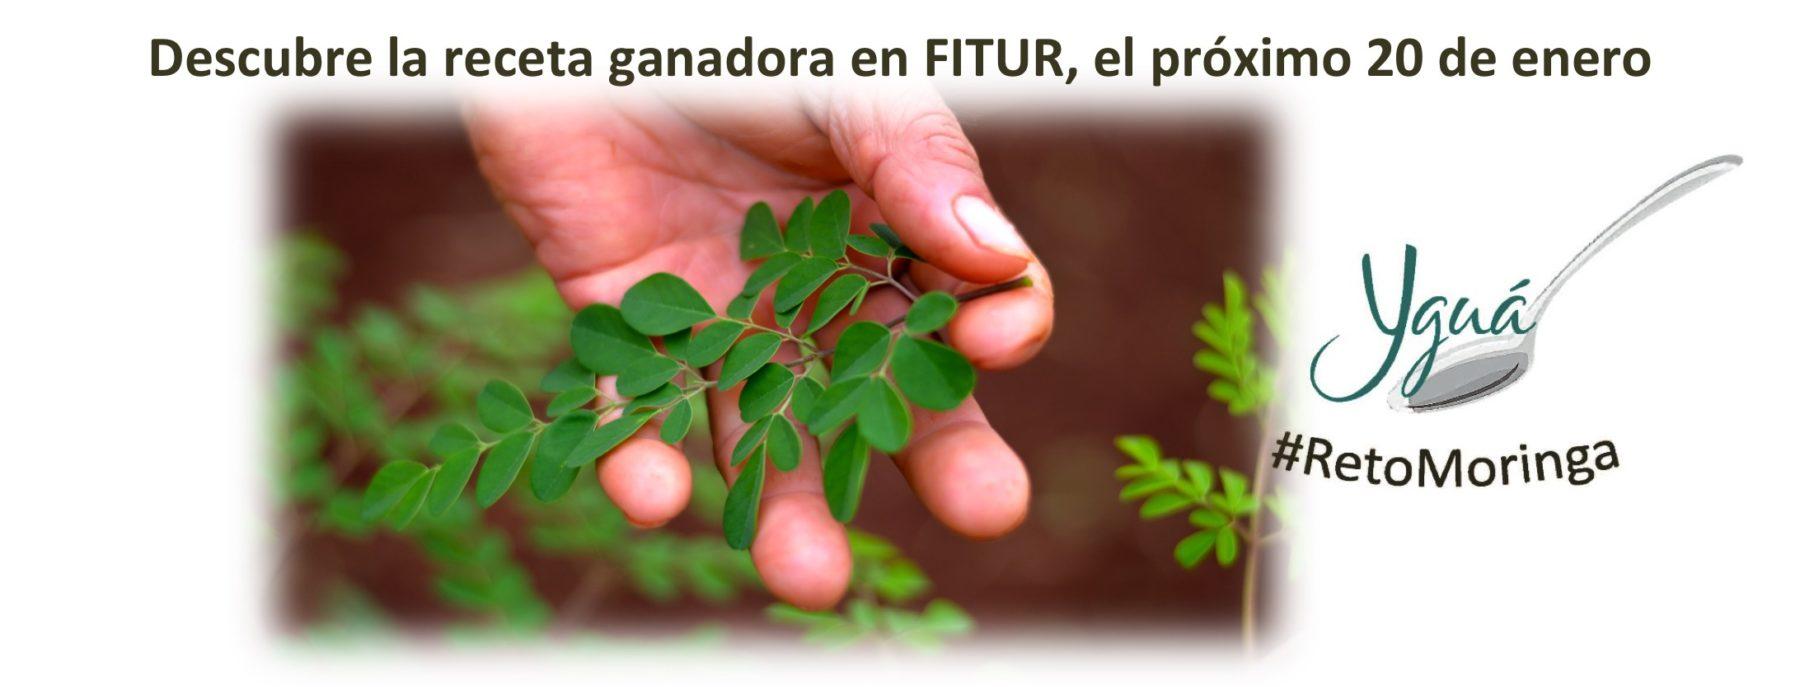 #RetoMoringa en FITUR